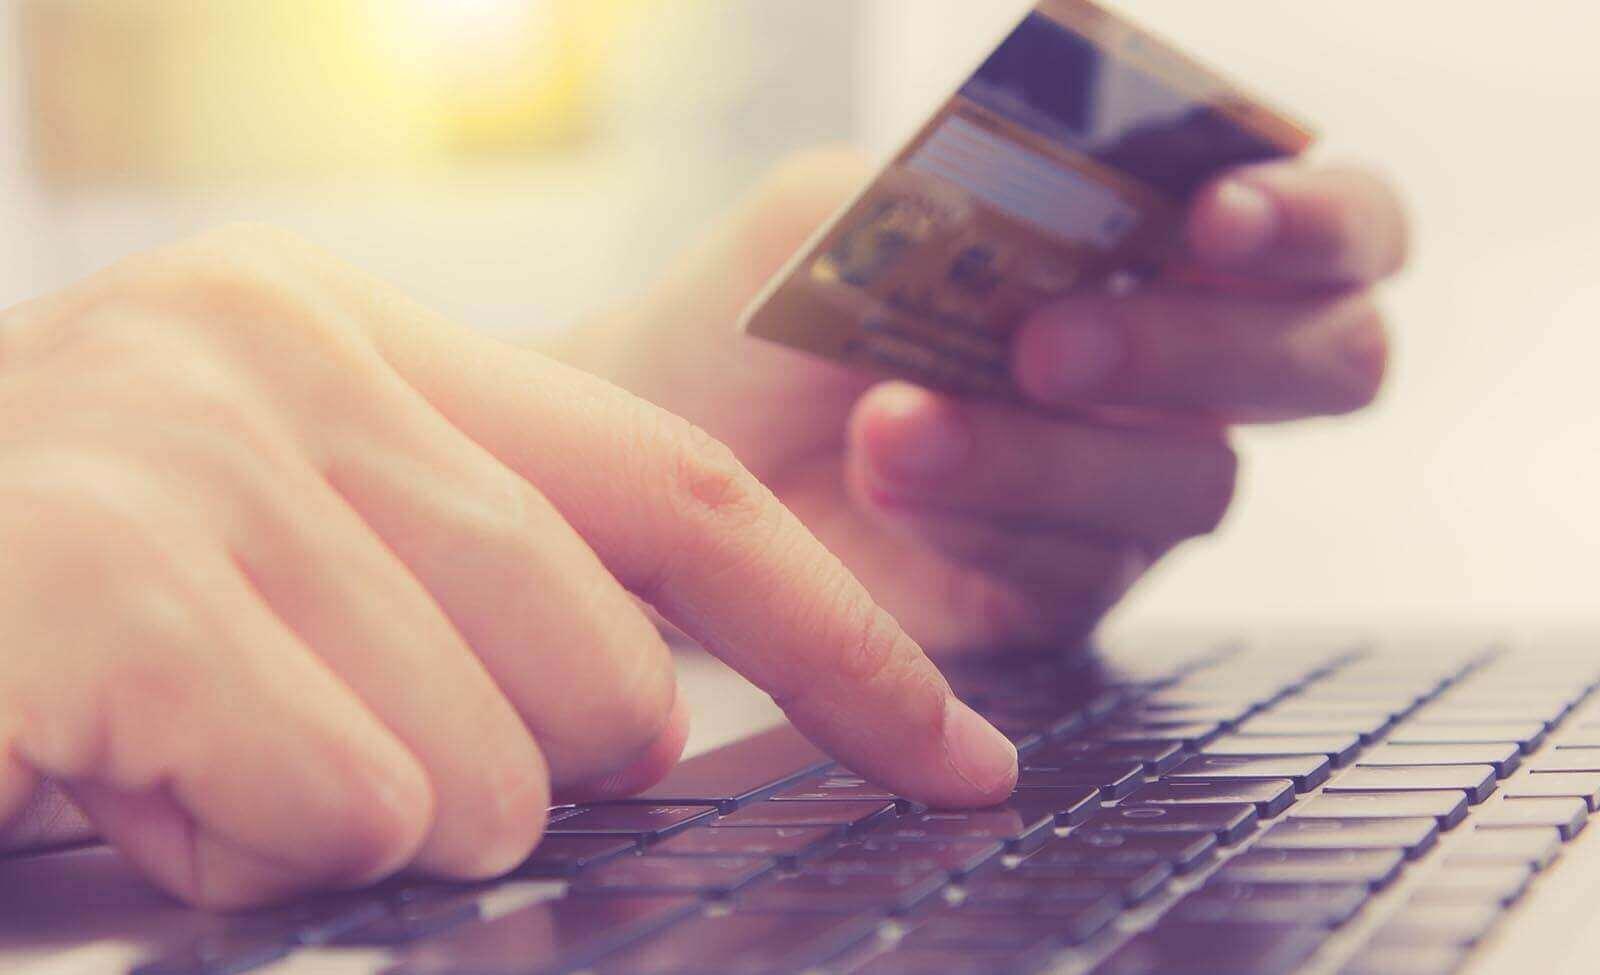 consumer enters debit card zip code on a laptop